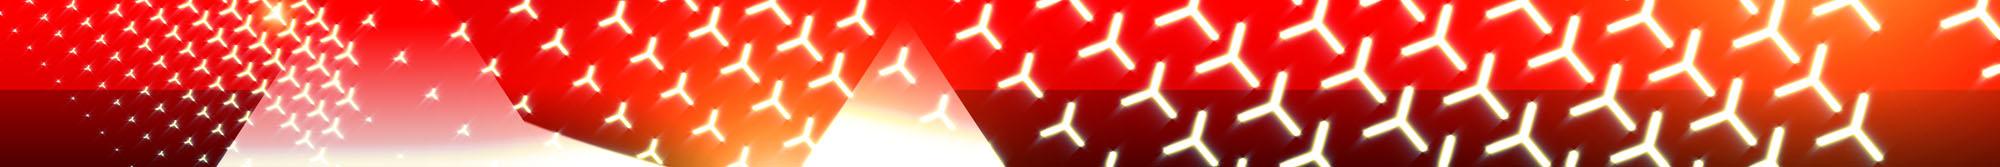 NTC_Design_R2_FullRes_F24.jpg